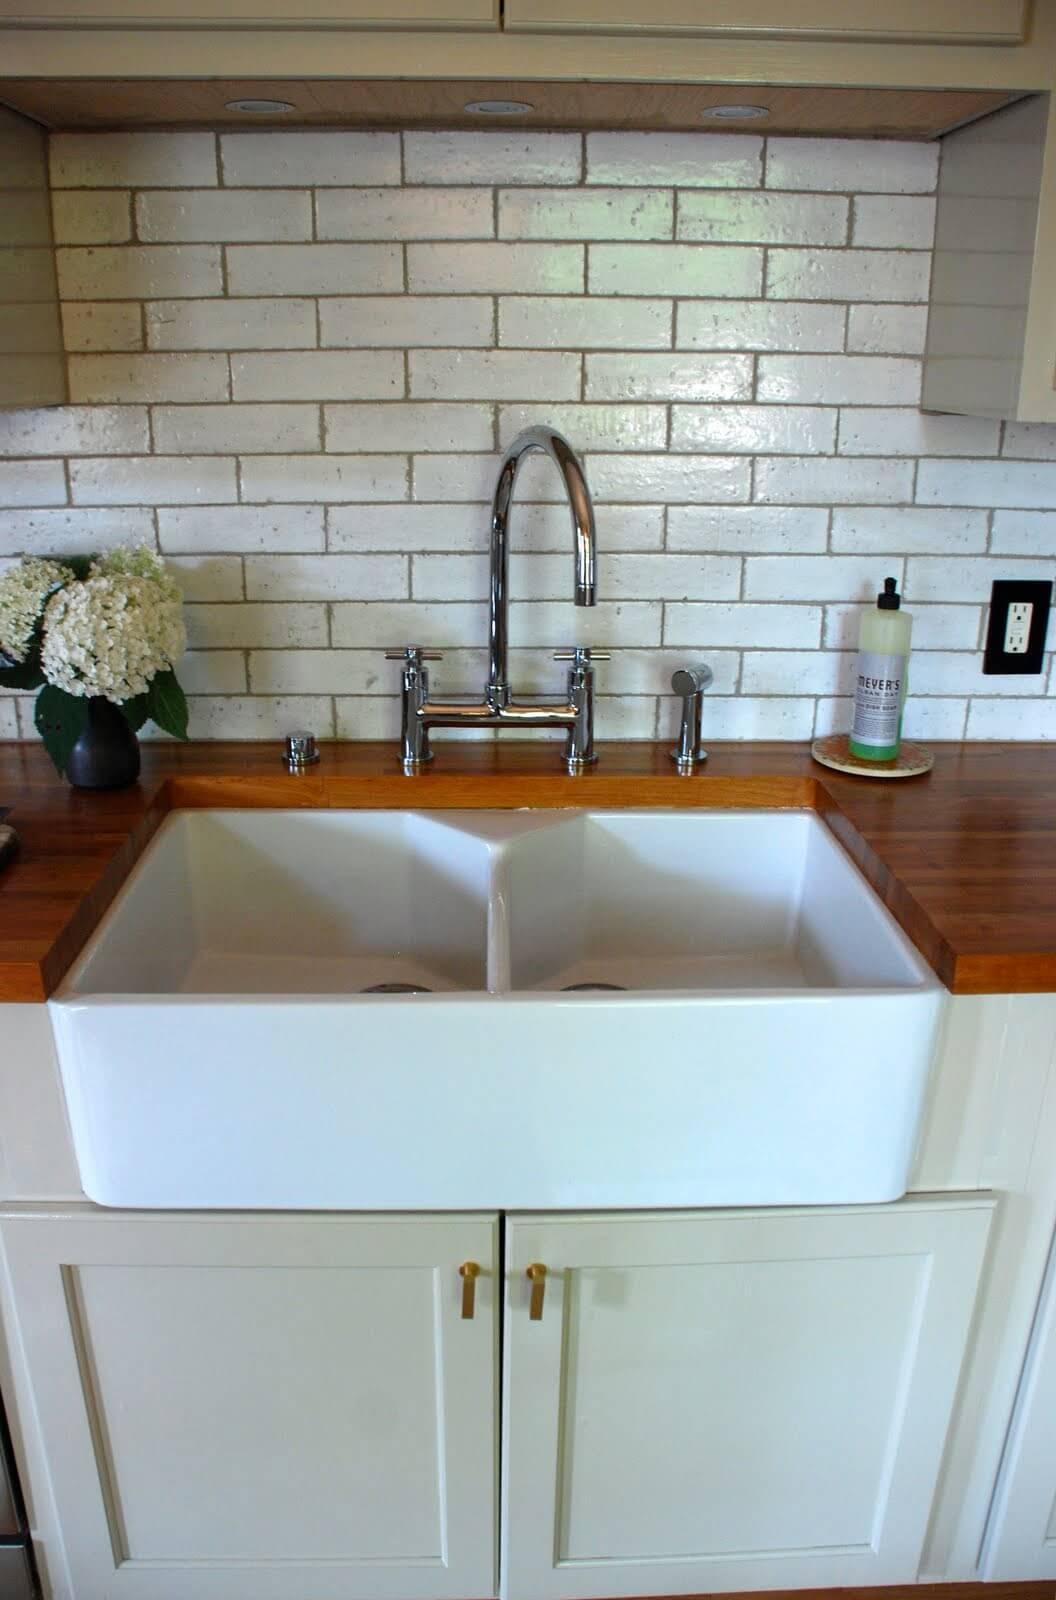 26 Farmhouse Kitchen Sink Ideas and Designs for 2020 on Kitchen Sink Ideas  id=87740